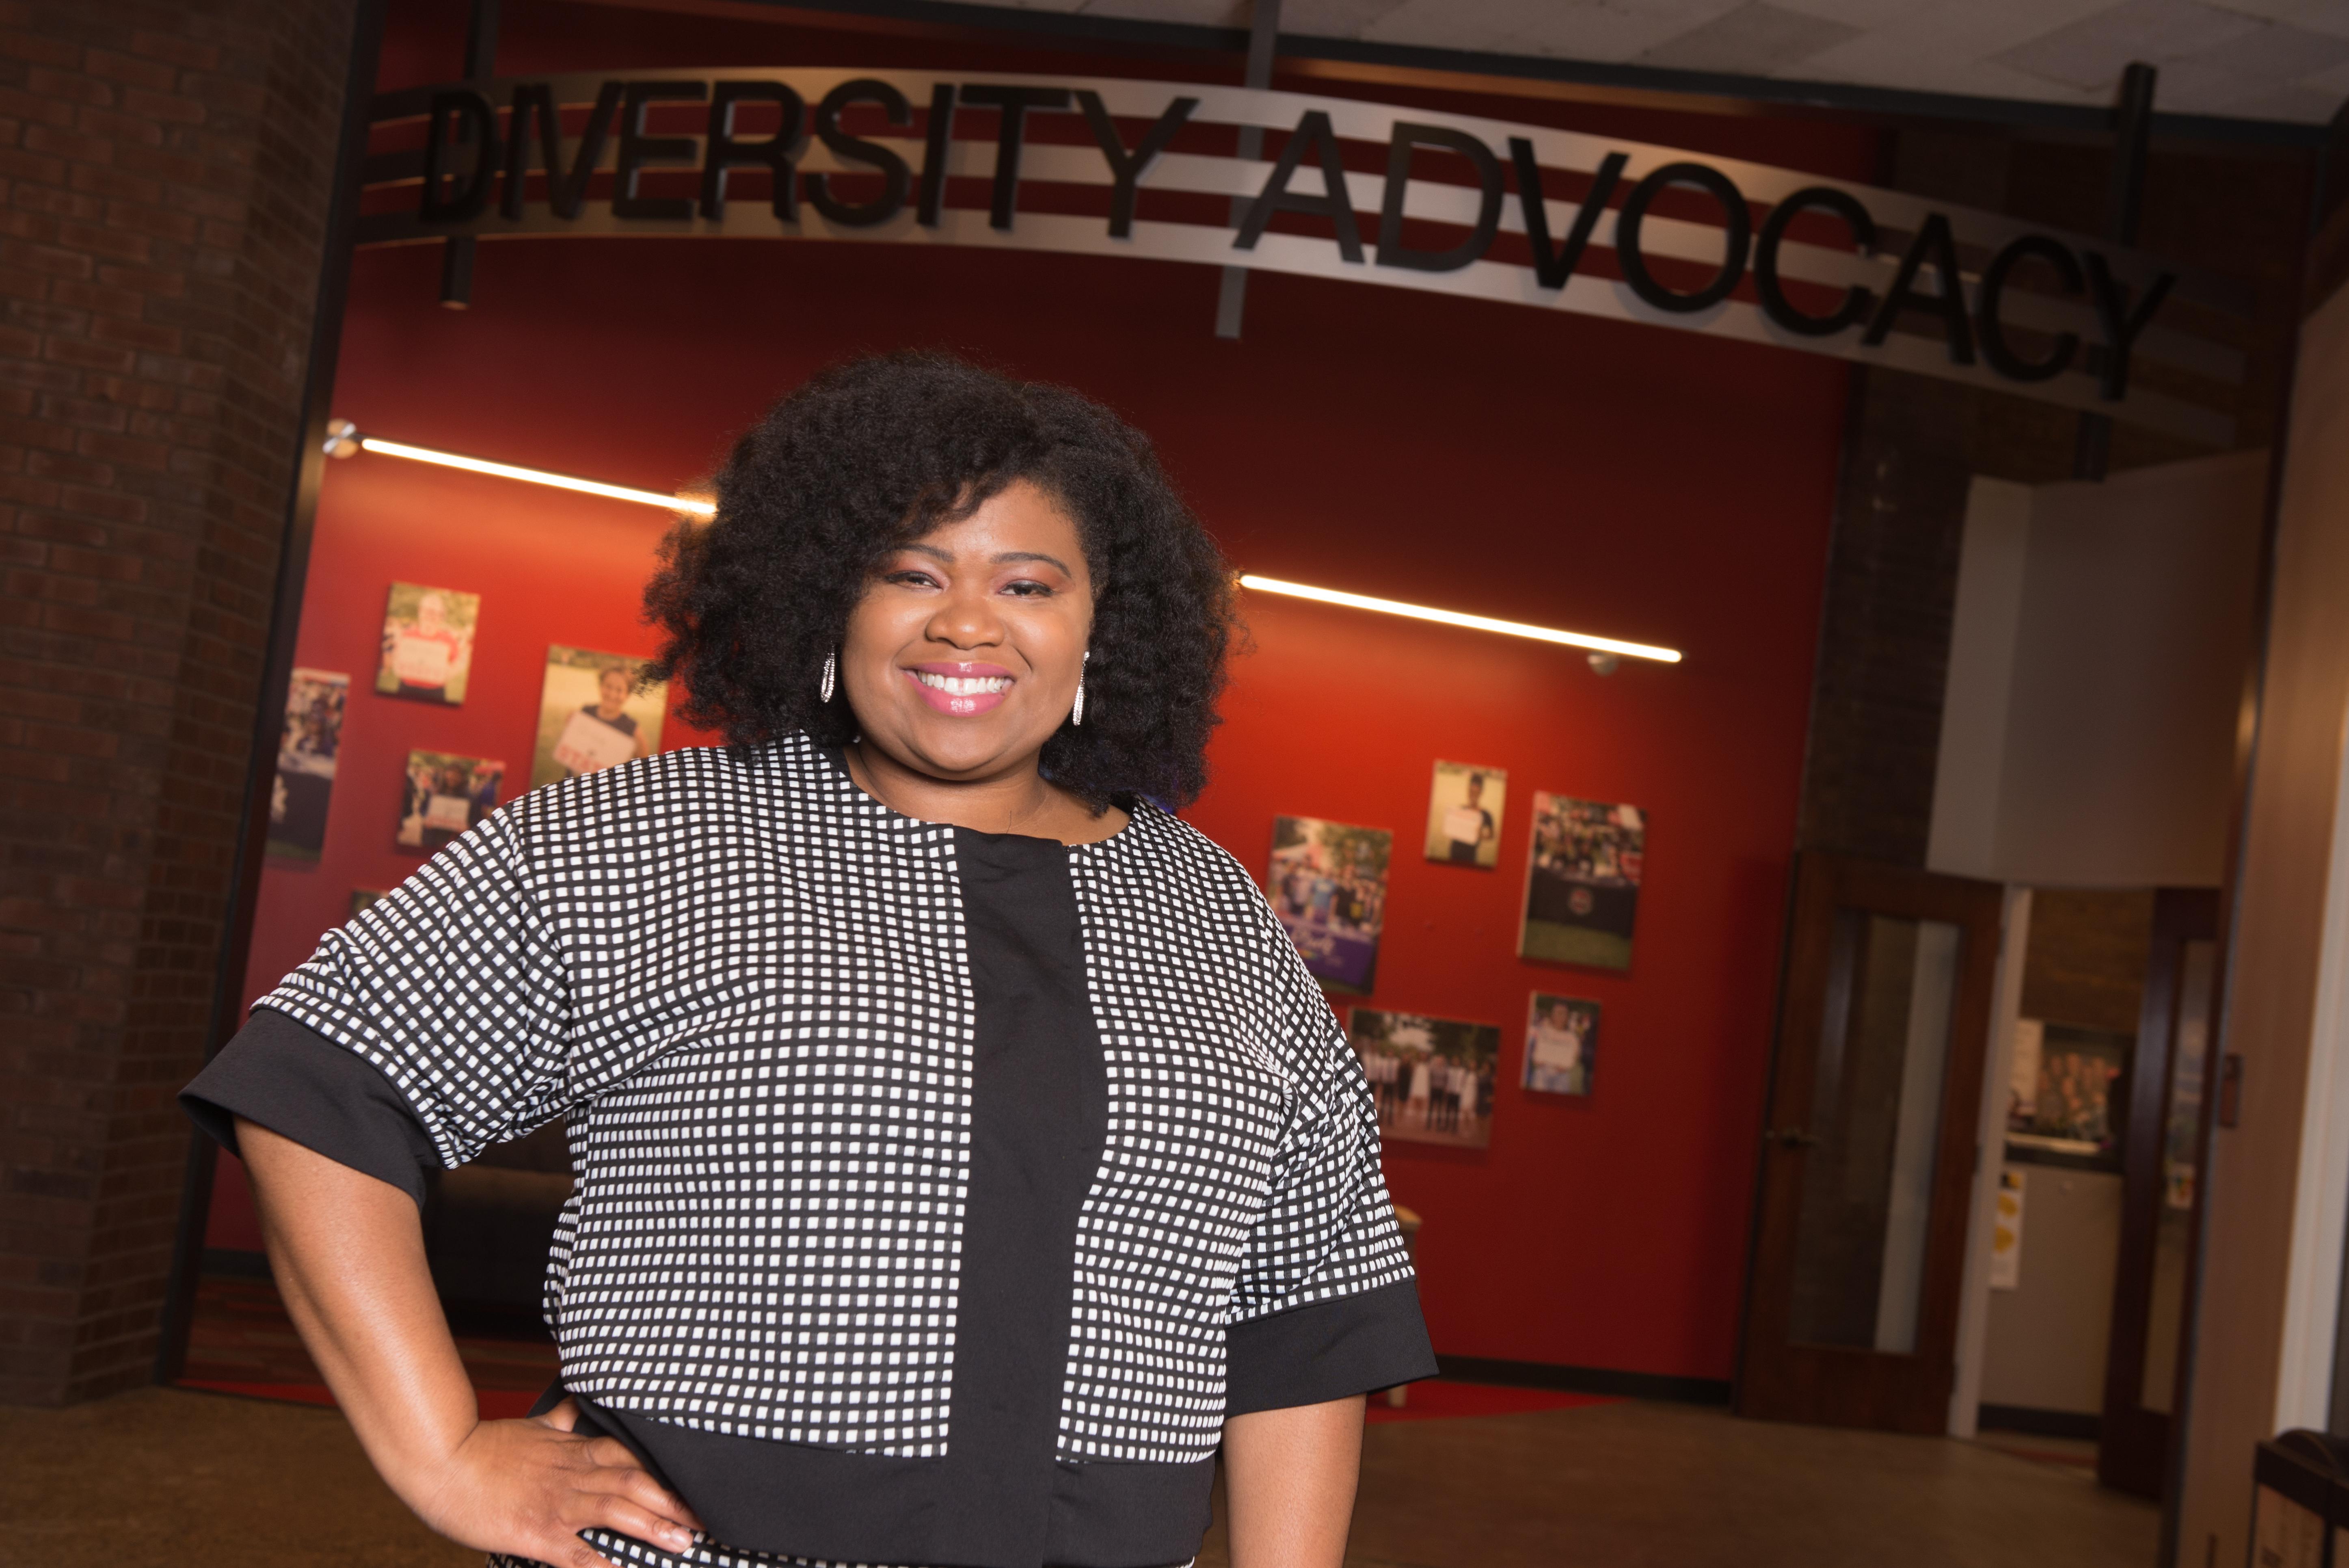 Christa Platt, standing outside the Diversity Advocacy Office in the Bone Student Center of Illinois State University